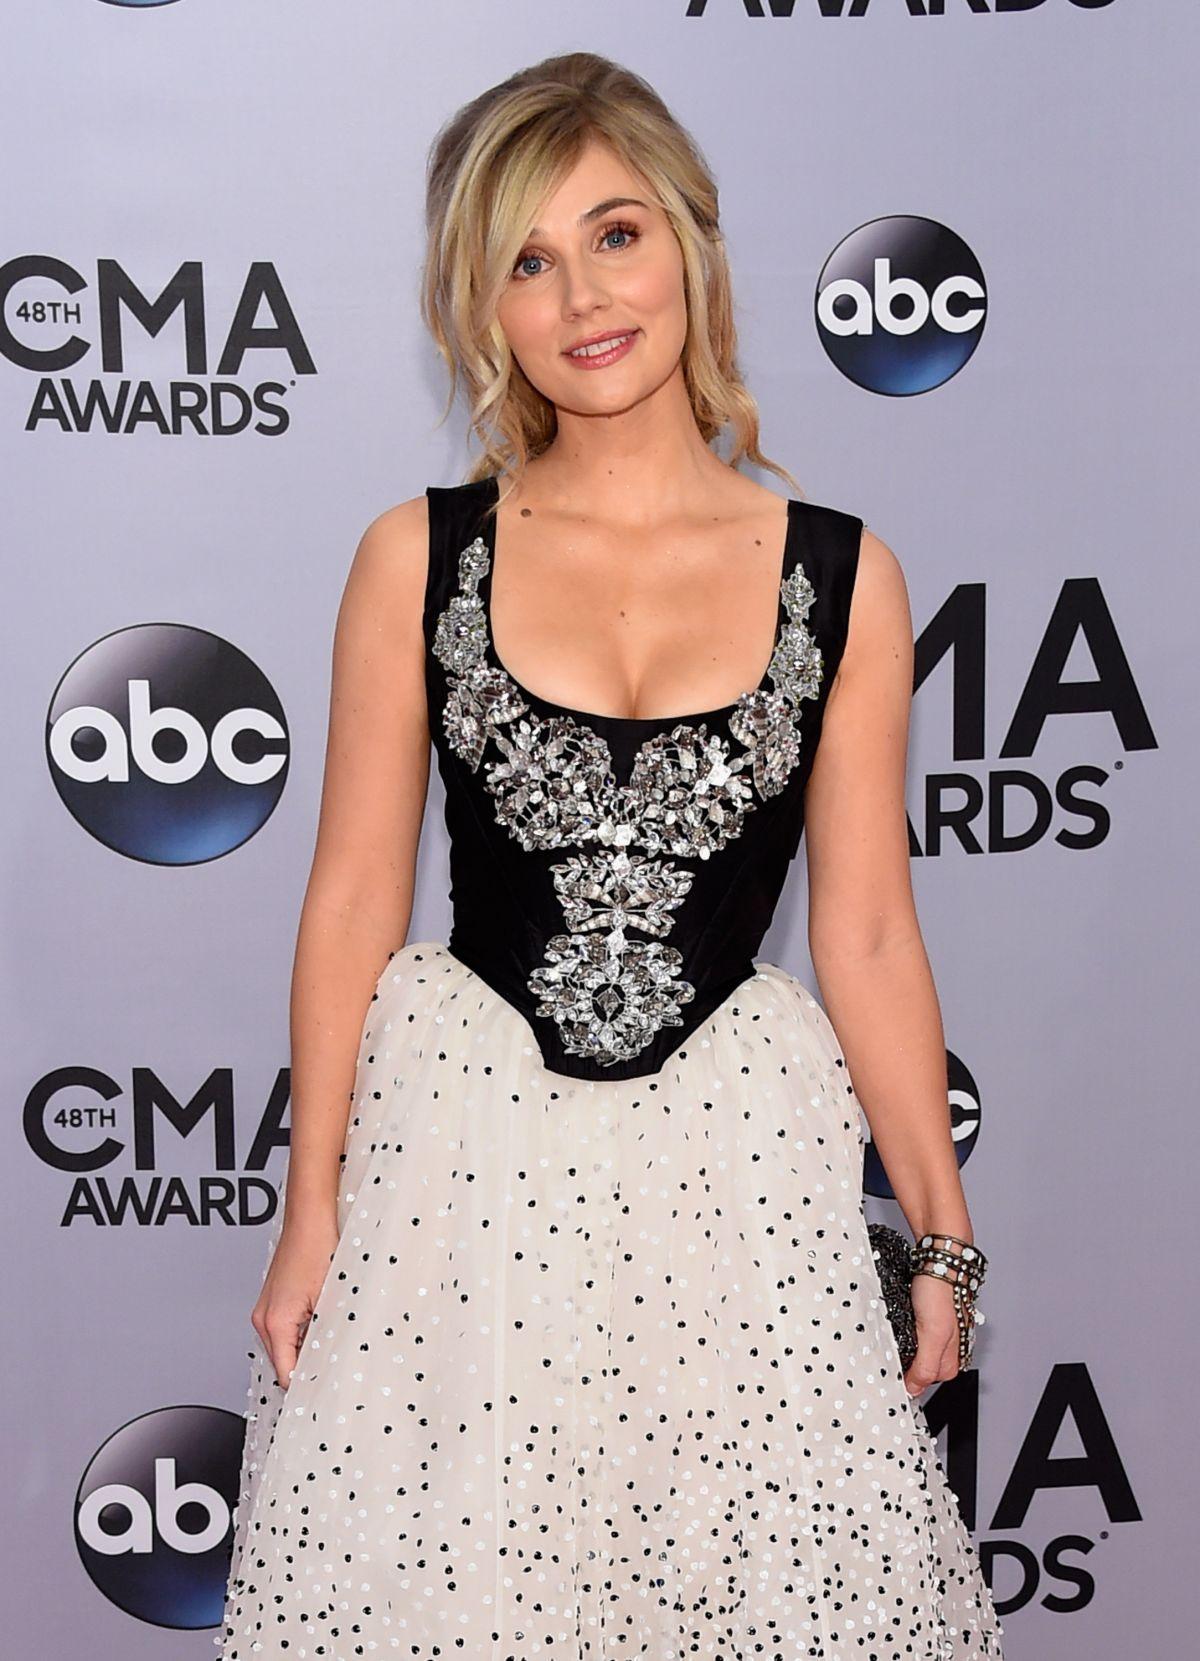 CLARE BOWEN at 2014 CMA Awards in Nashville